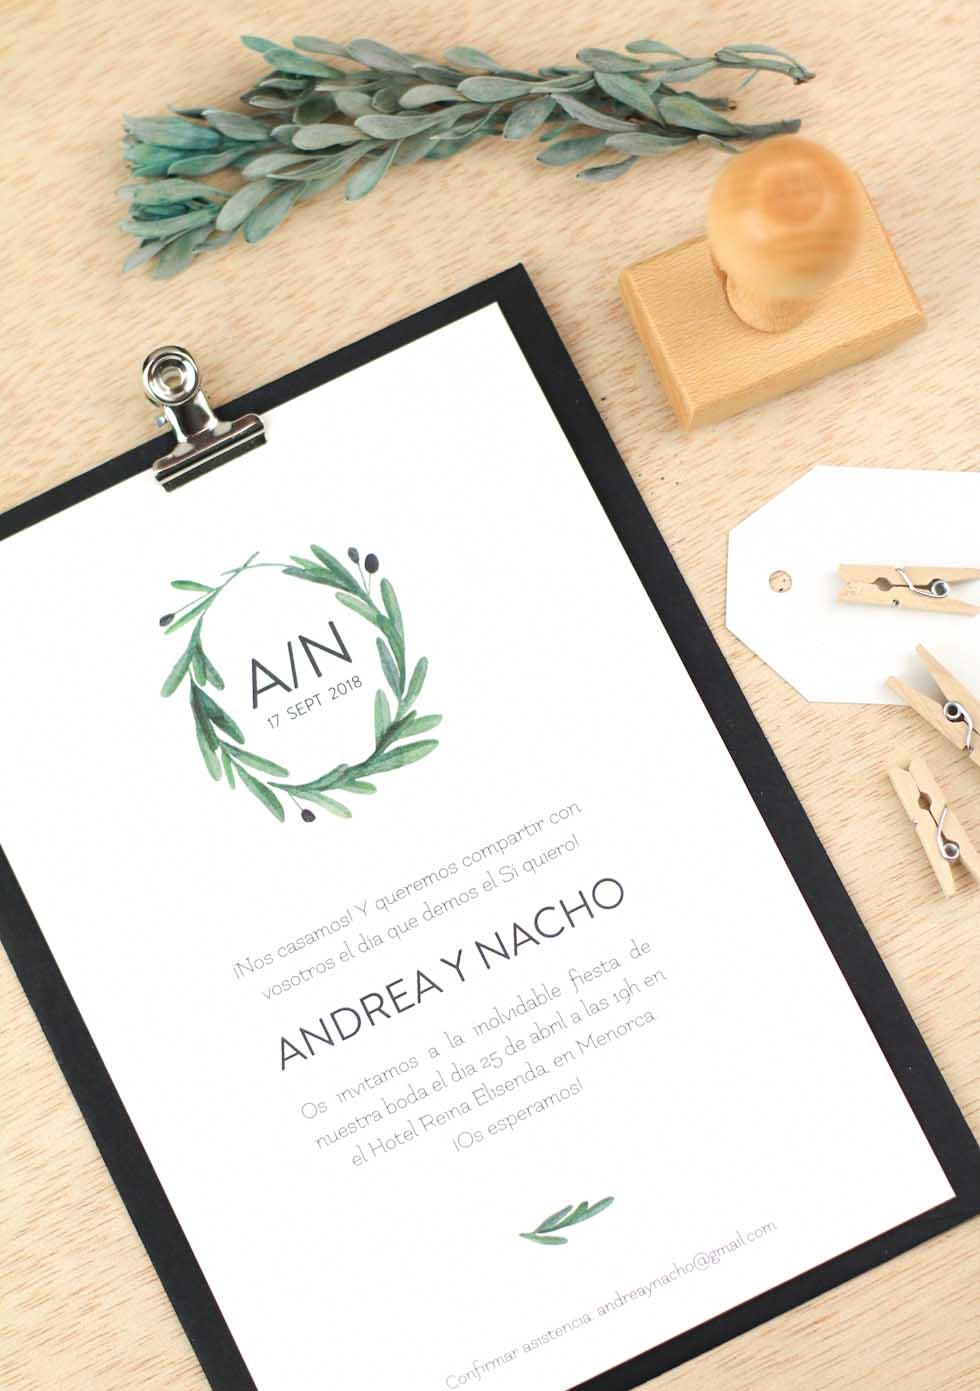 3a7d054200d4b Invitaciones de boda rusticas acuarela de olivos